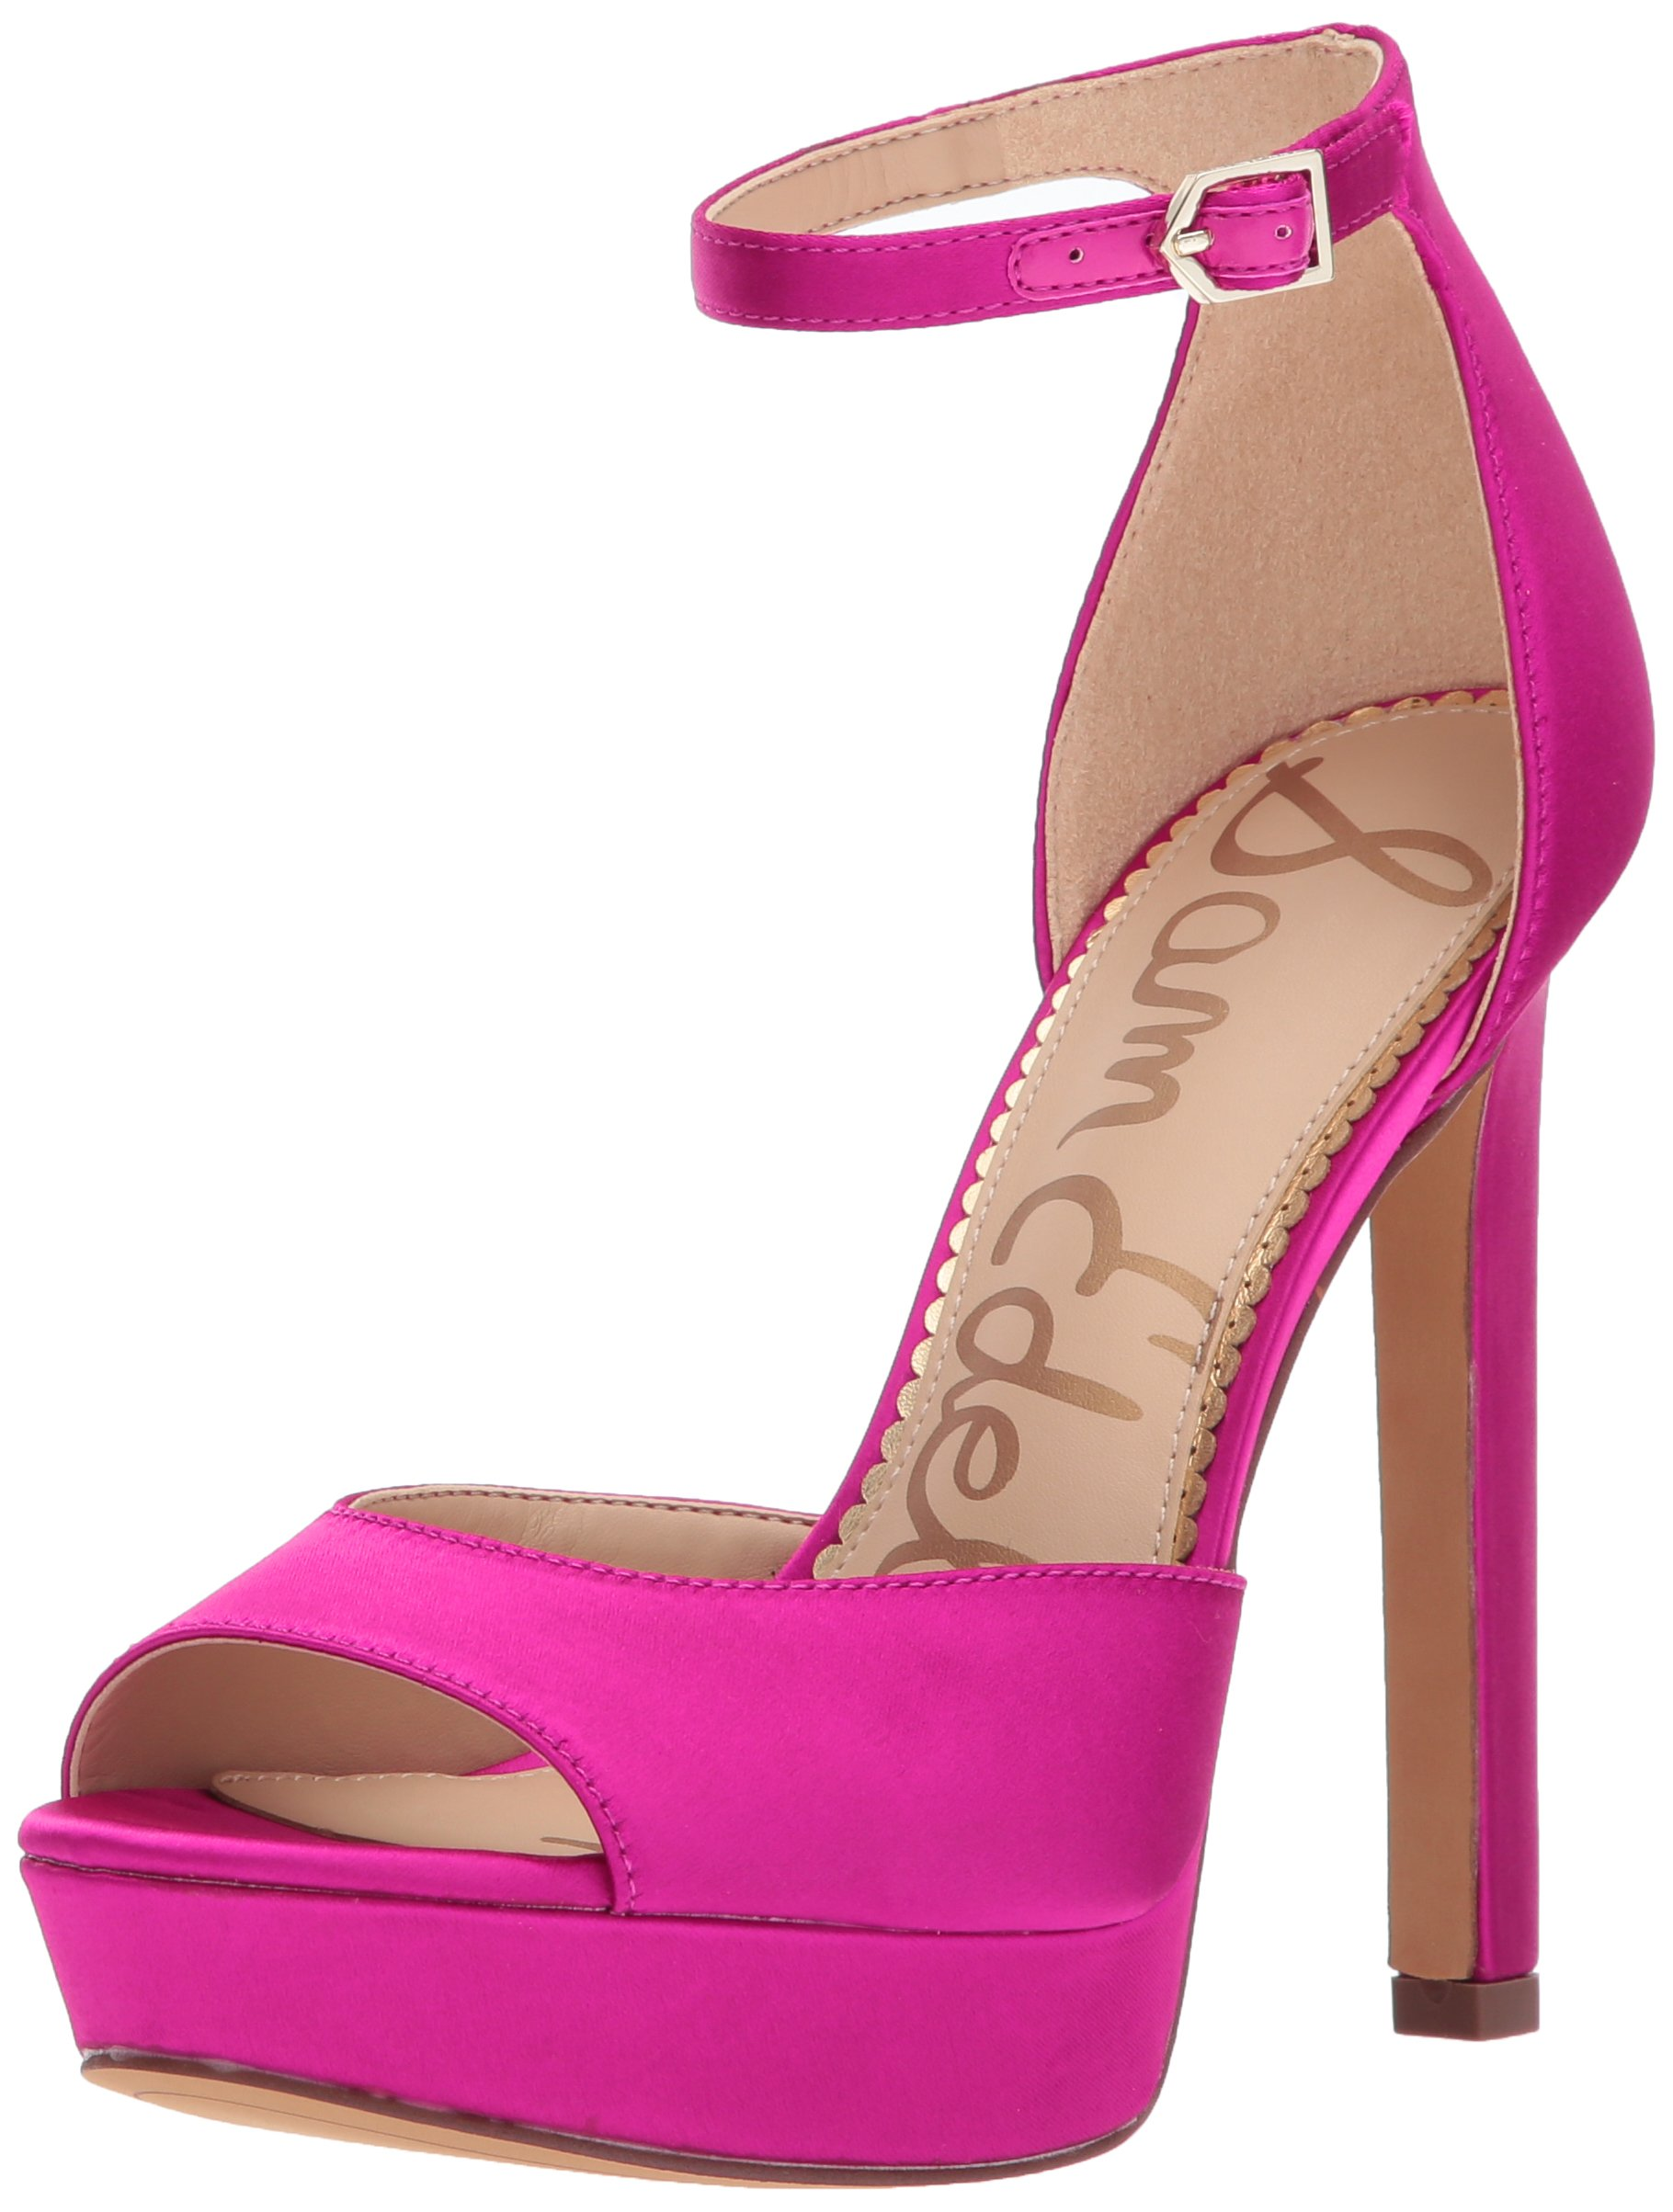 Sam Edelman Women's Wallace Heeled Sandal, Berry Crush, 9.5 Medium US